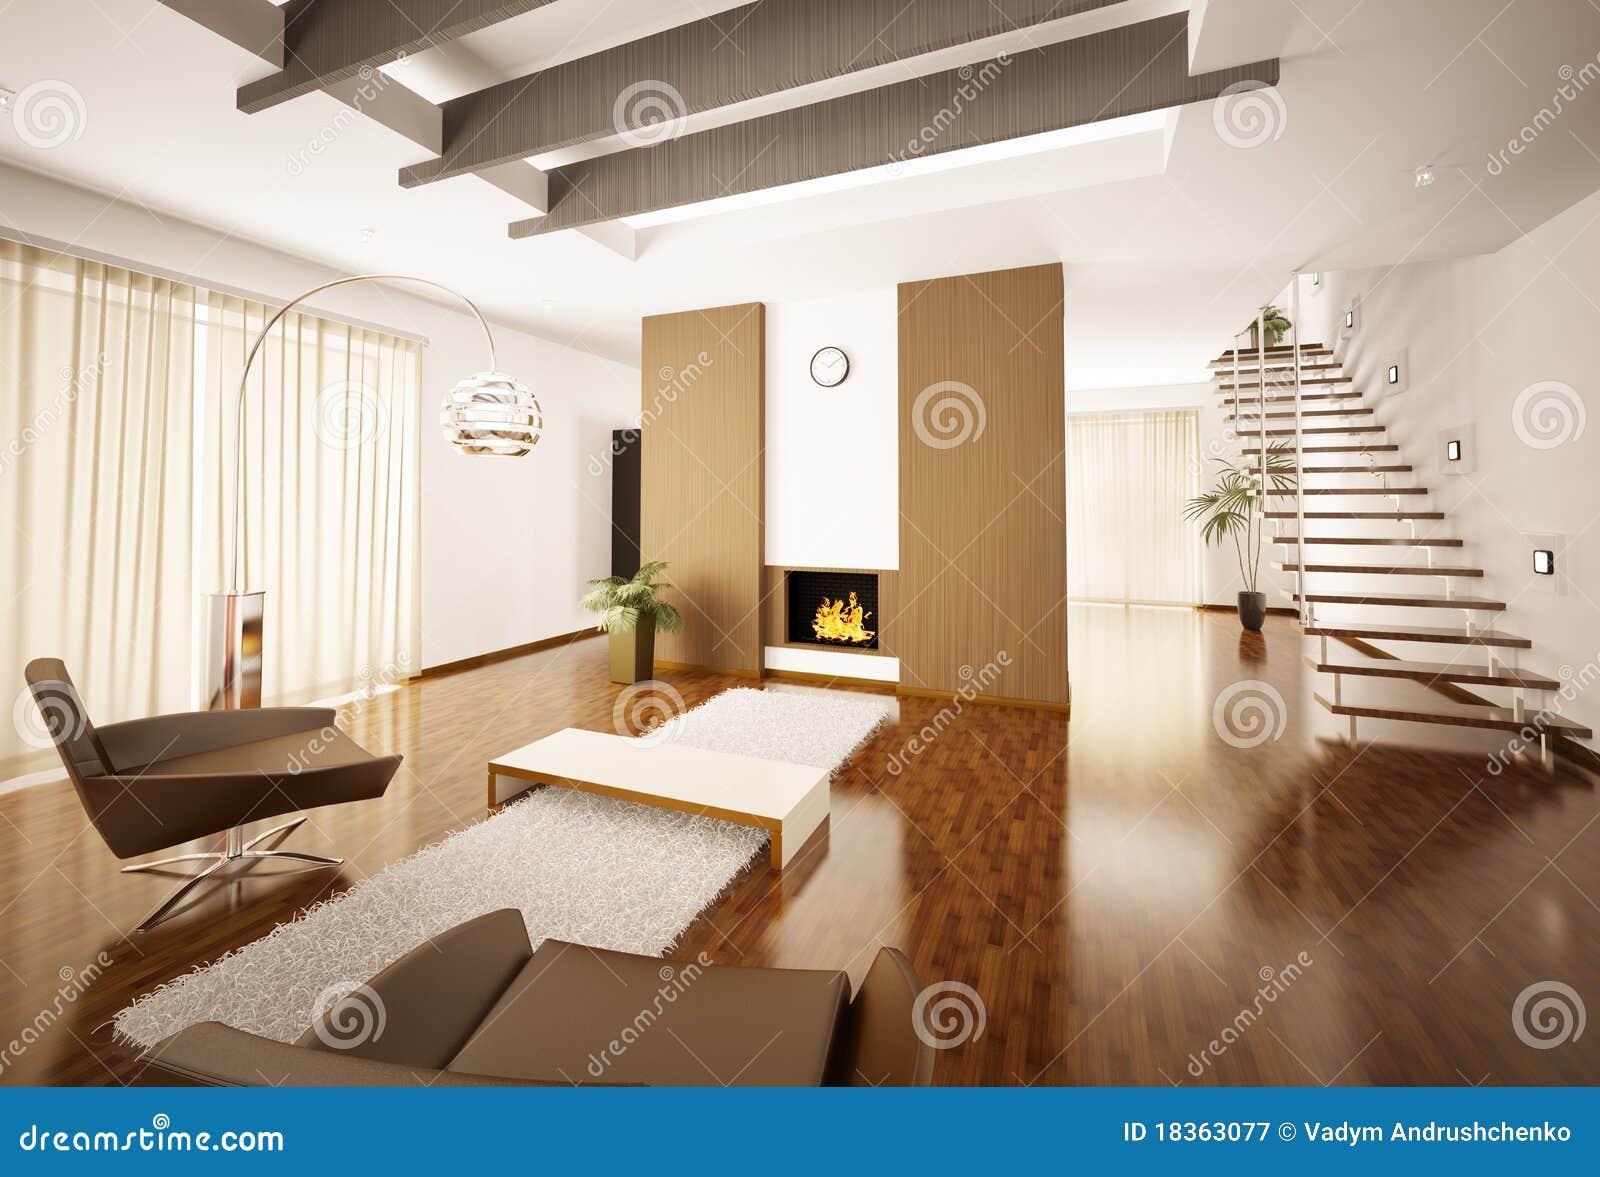 L 39 appartamento moderno 3d interno rende fotografia stock for Appartamento moderno